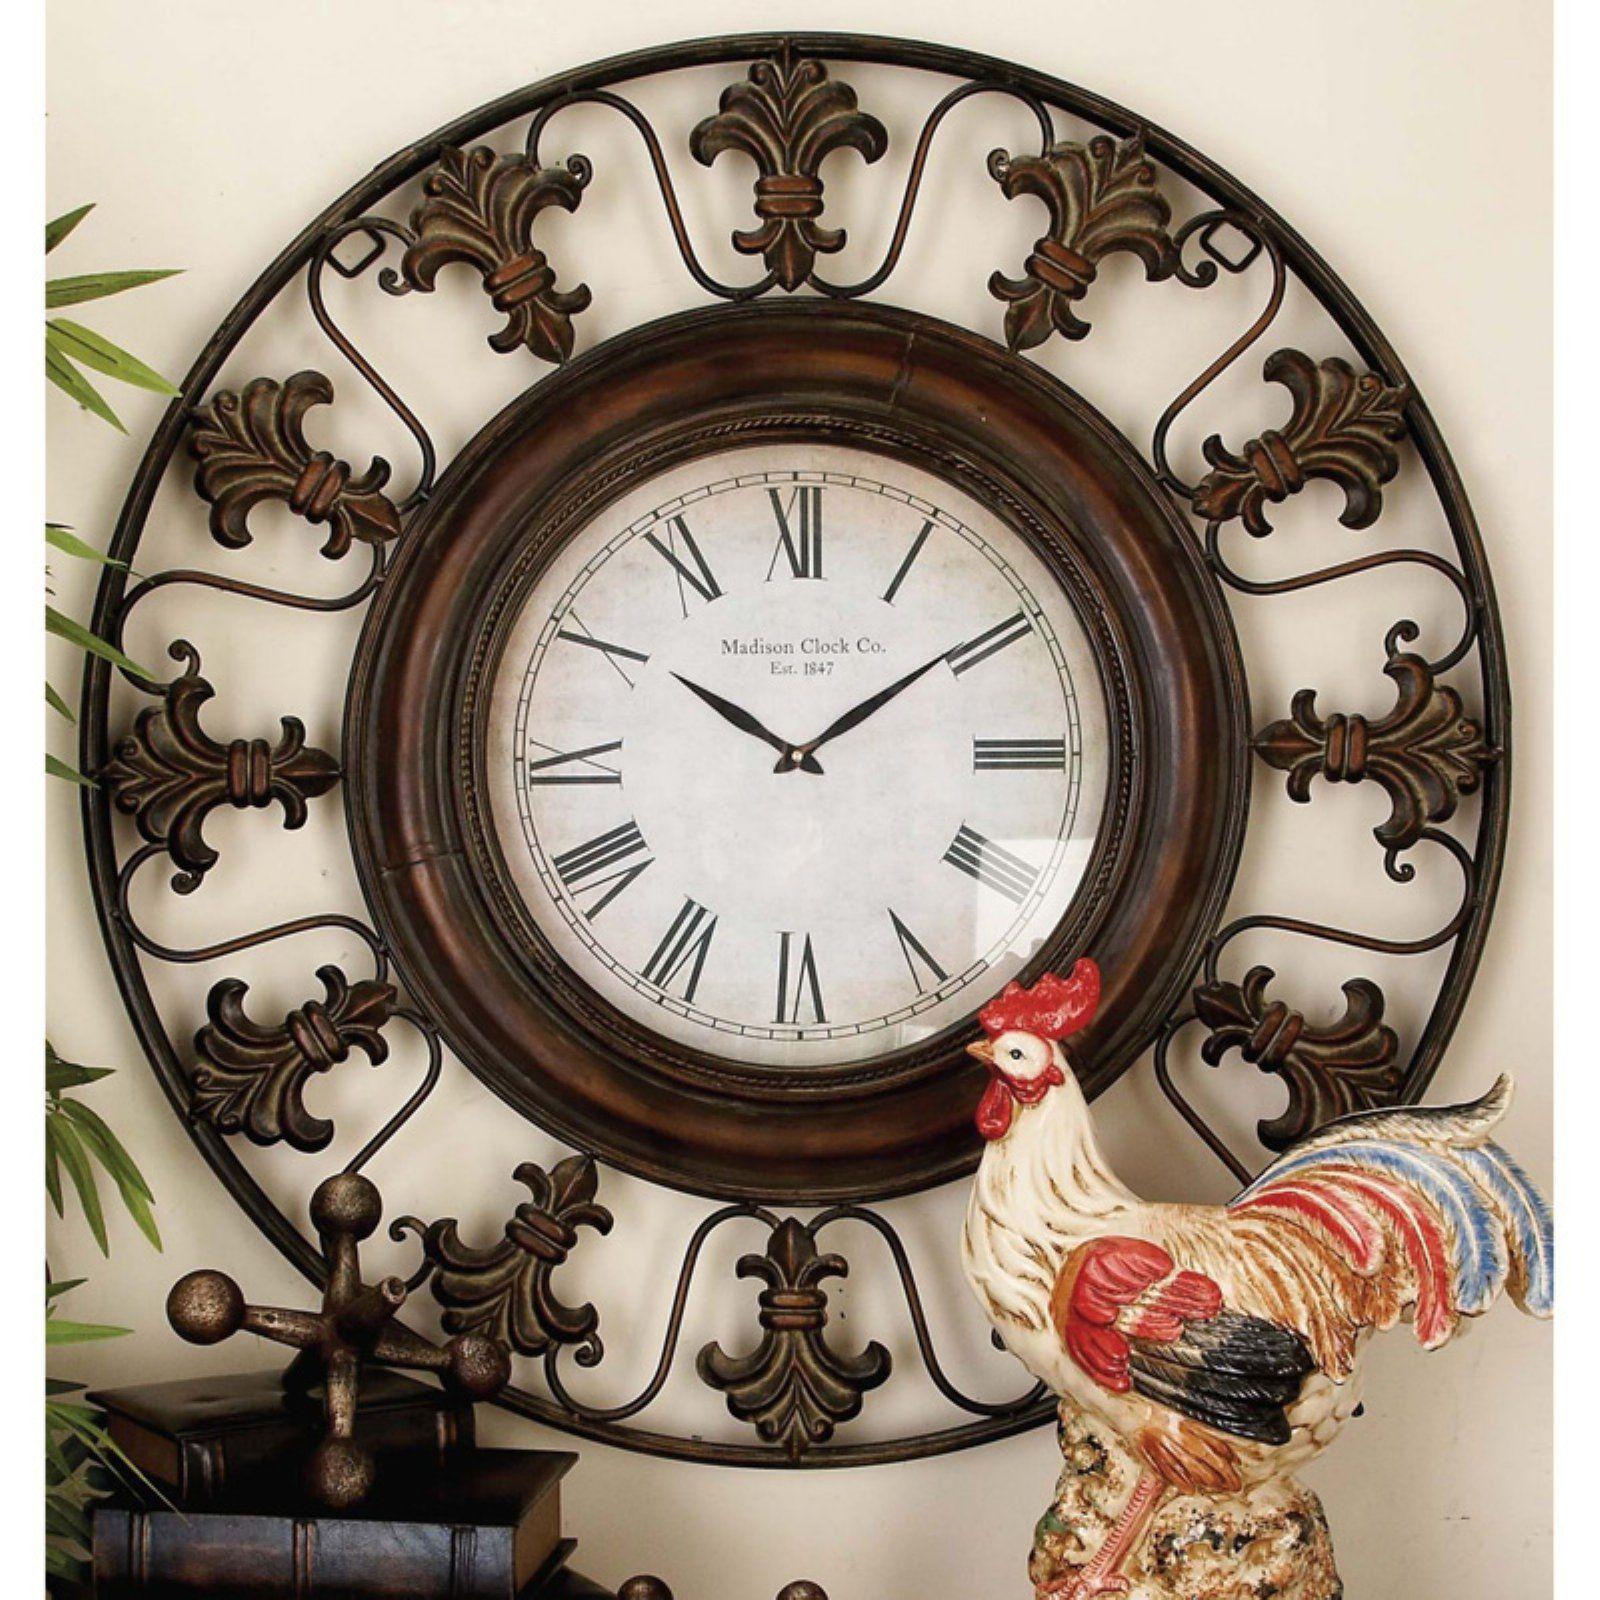 Decmode Metal Wall Clock 38 Diam In In 2021 Wall Clock Rustic Wall Clocks Black Wall Clock